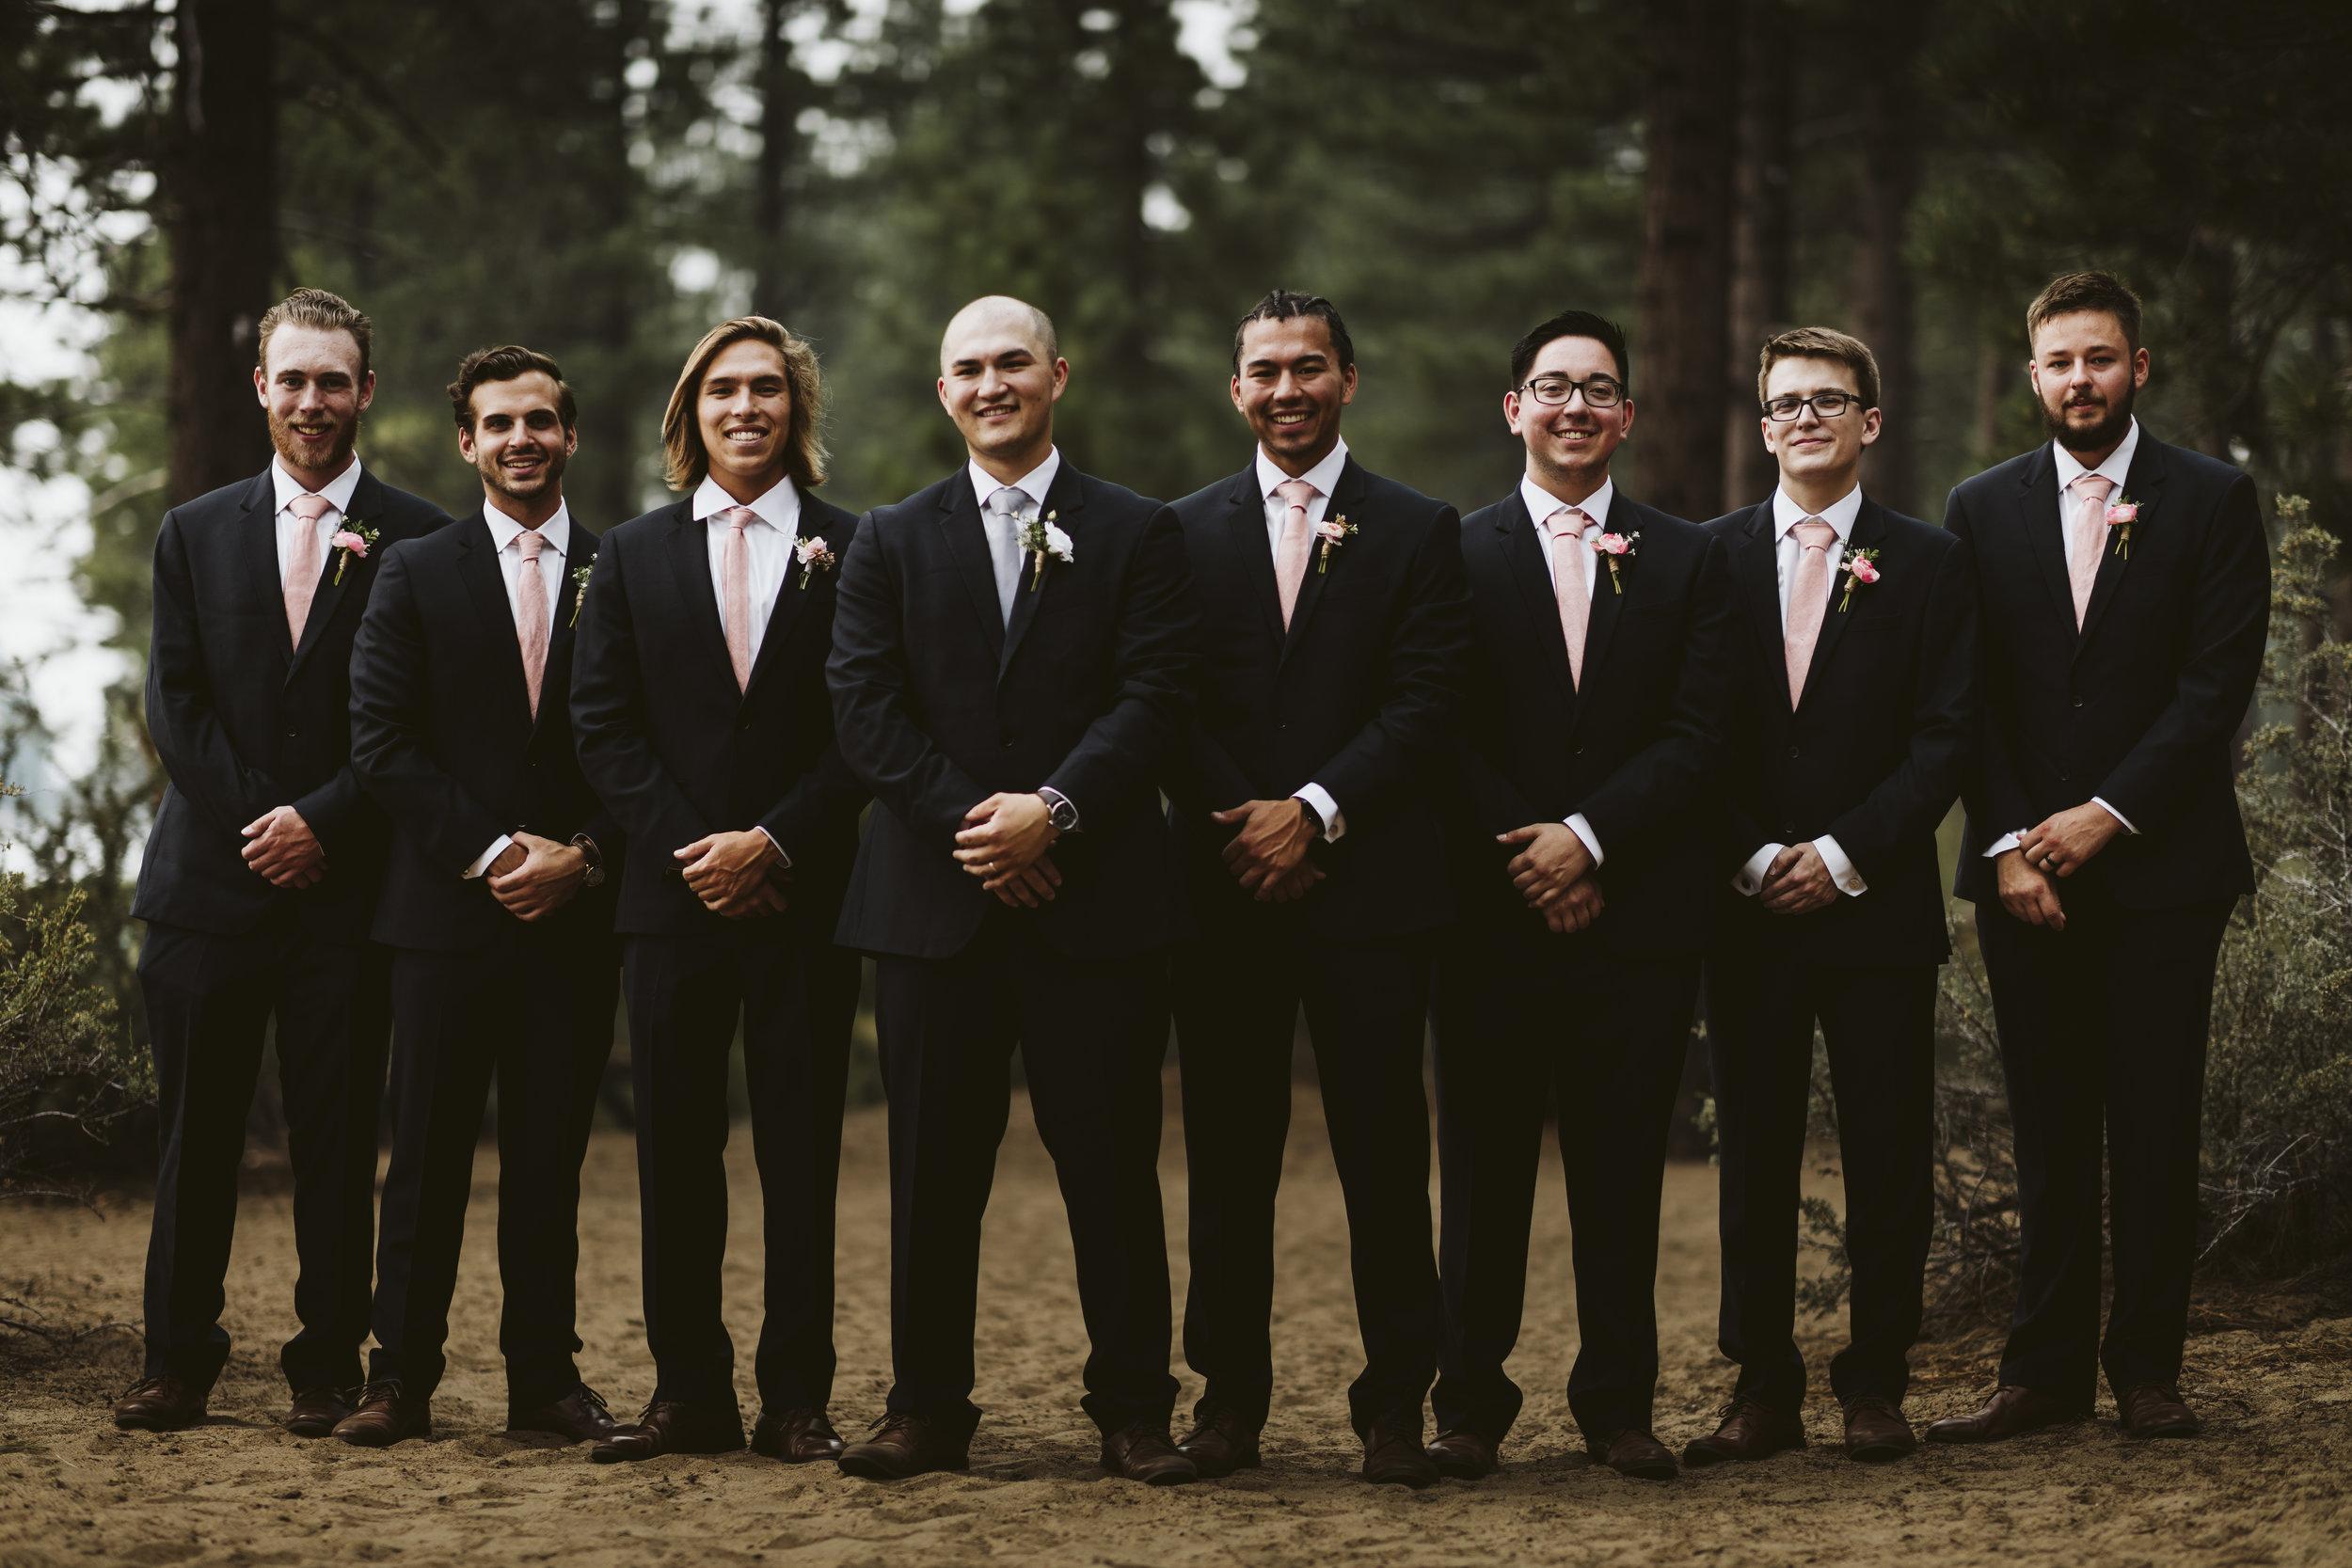 _P8A4409vild-vild photography-photography-wedding-wedding photography-tahoe-lake tahoe-lake tahoe wedding photographer-nevada wedding photographer-mountain wedding.jpg